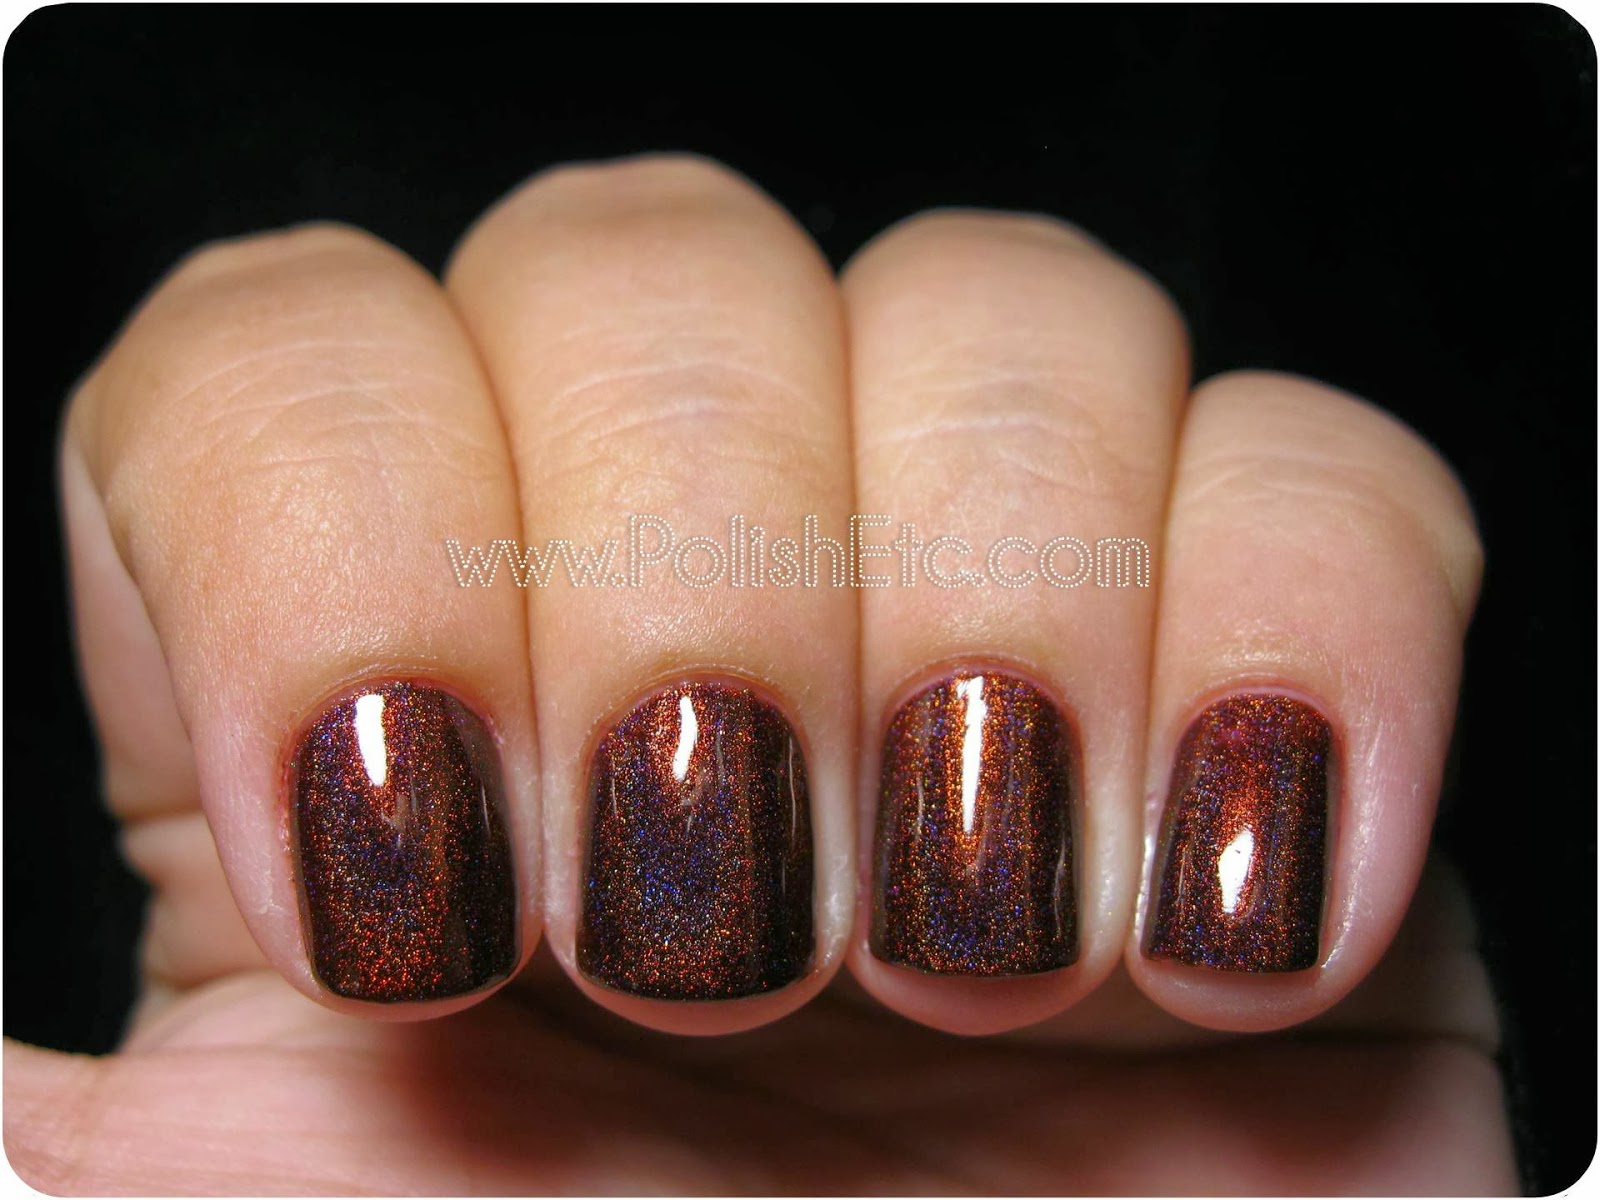 Glitter Gal Belgian Chocolate Swatches - Polish Etc.